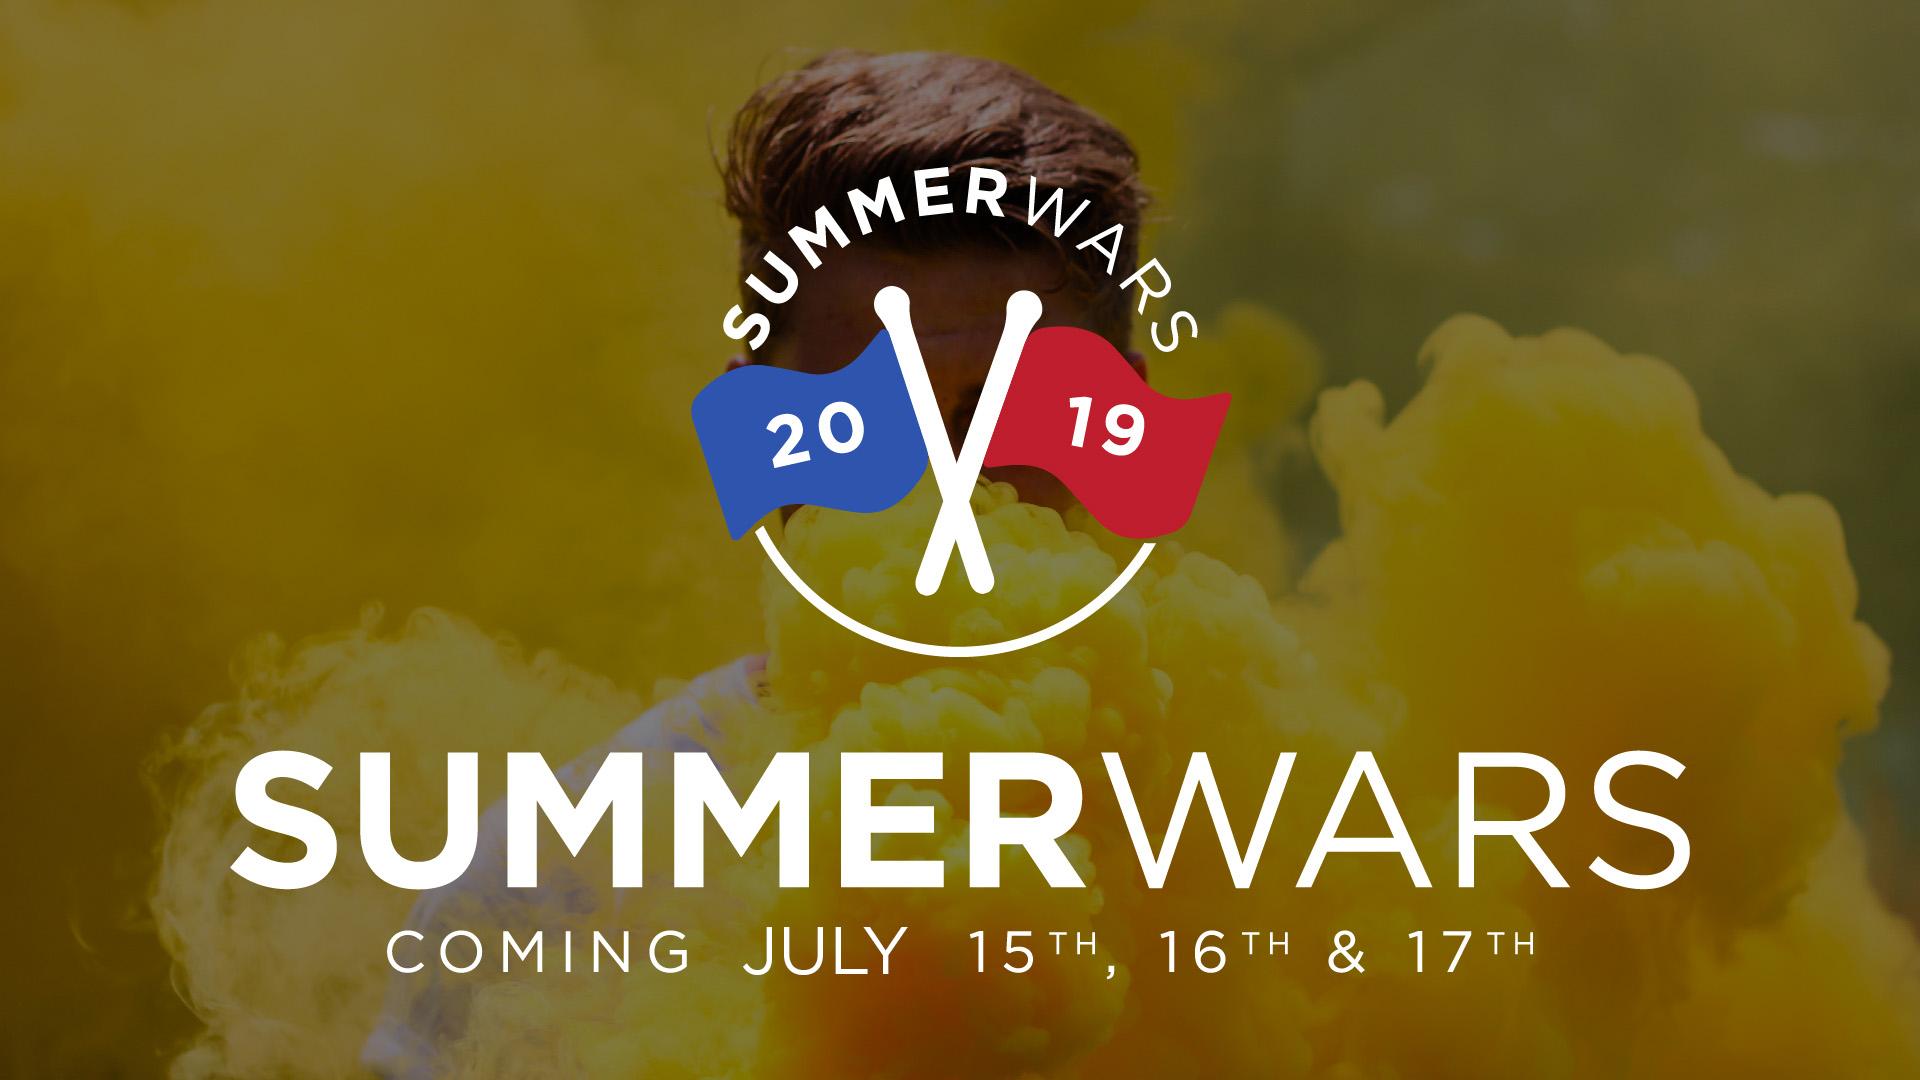 Summer-wars-e-Scoop.jpg